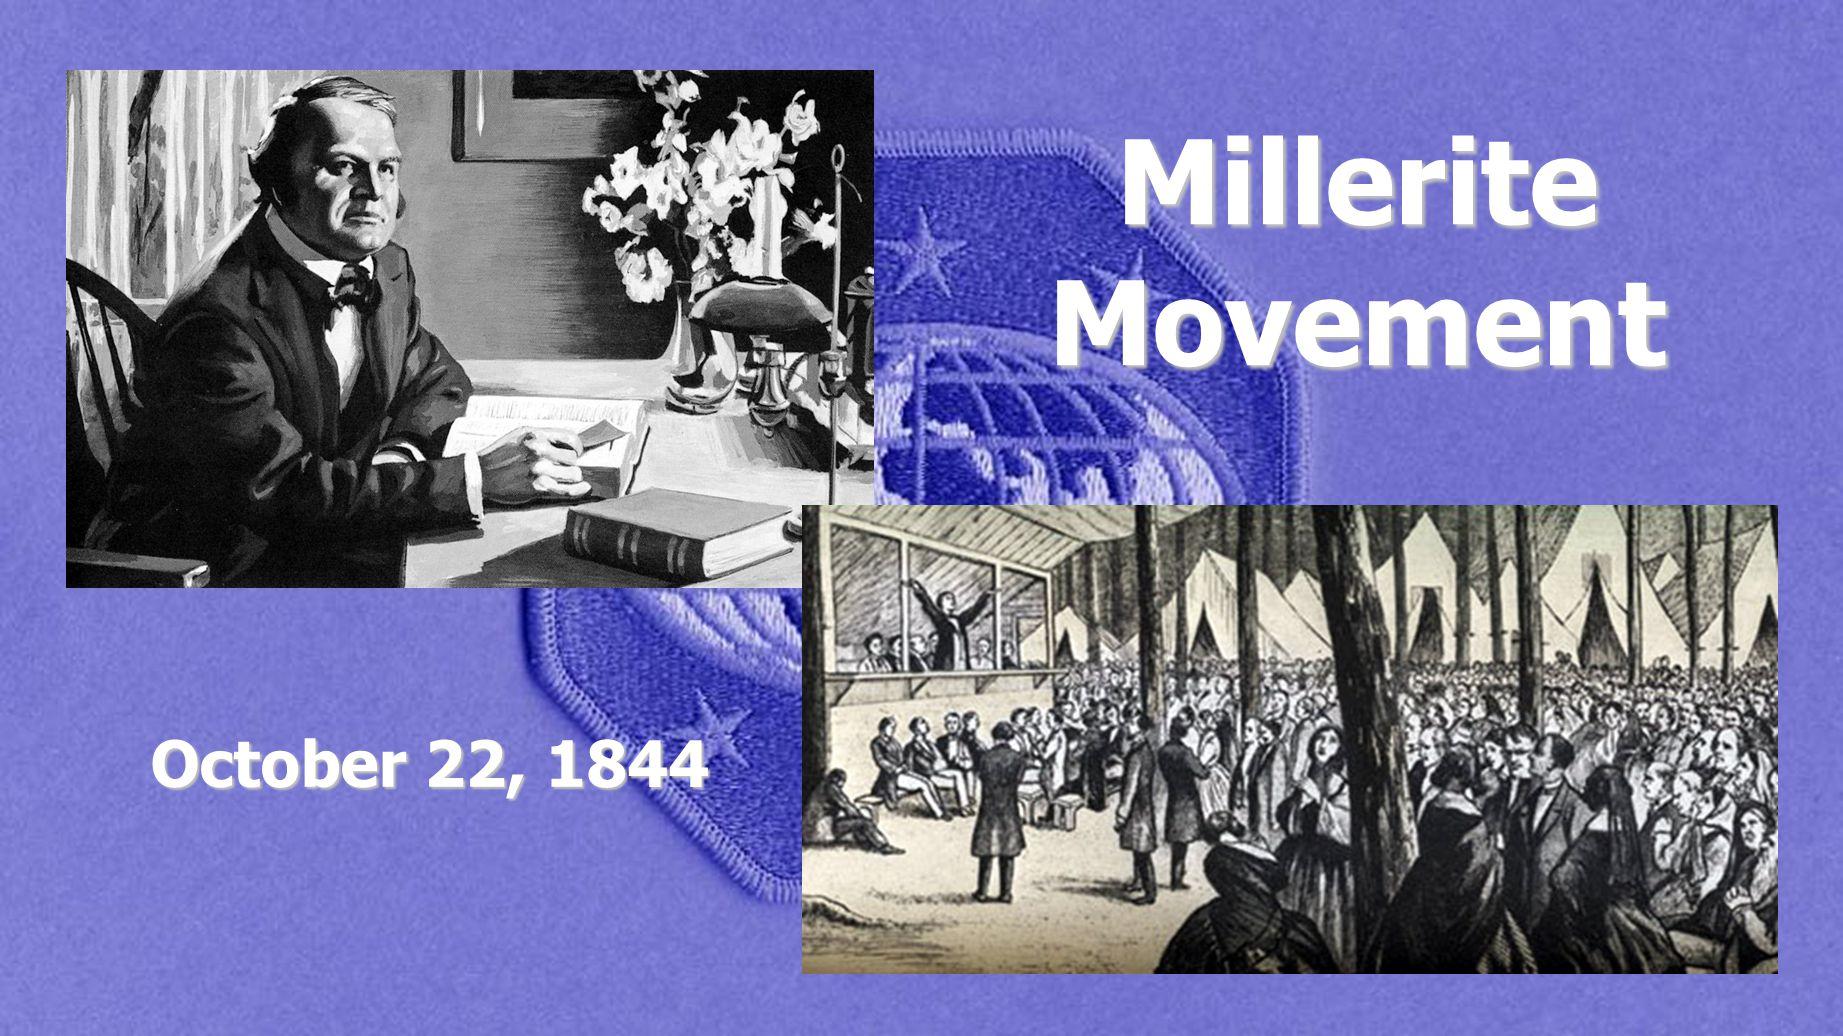 Millerite Movement October 22, 1844